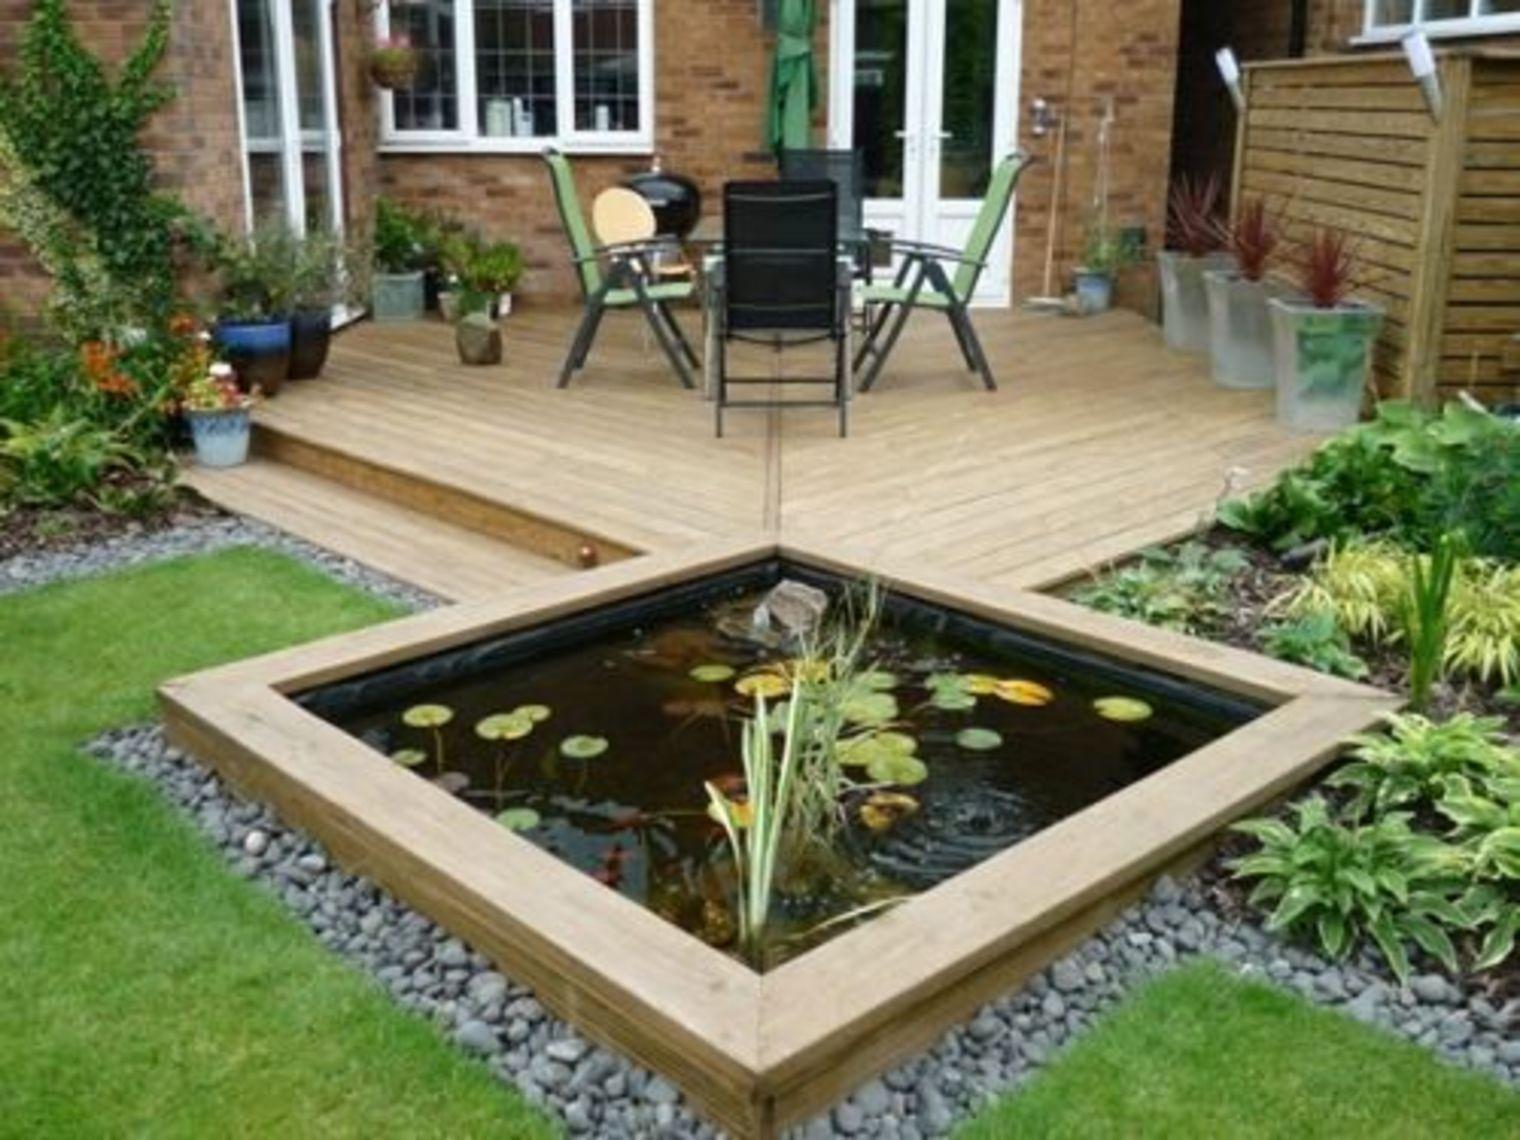 16 Attractive Garden Pond Designs That Everyone Should See Garden Pond Design Ponds Backyard Modern Garden Design Modern backyard koi pond